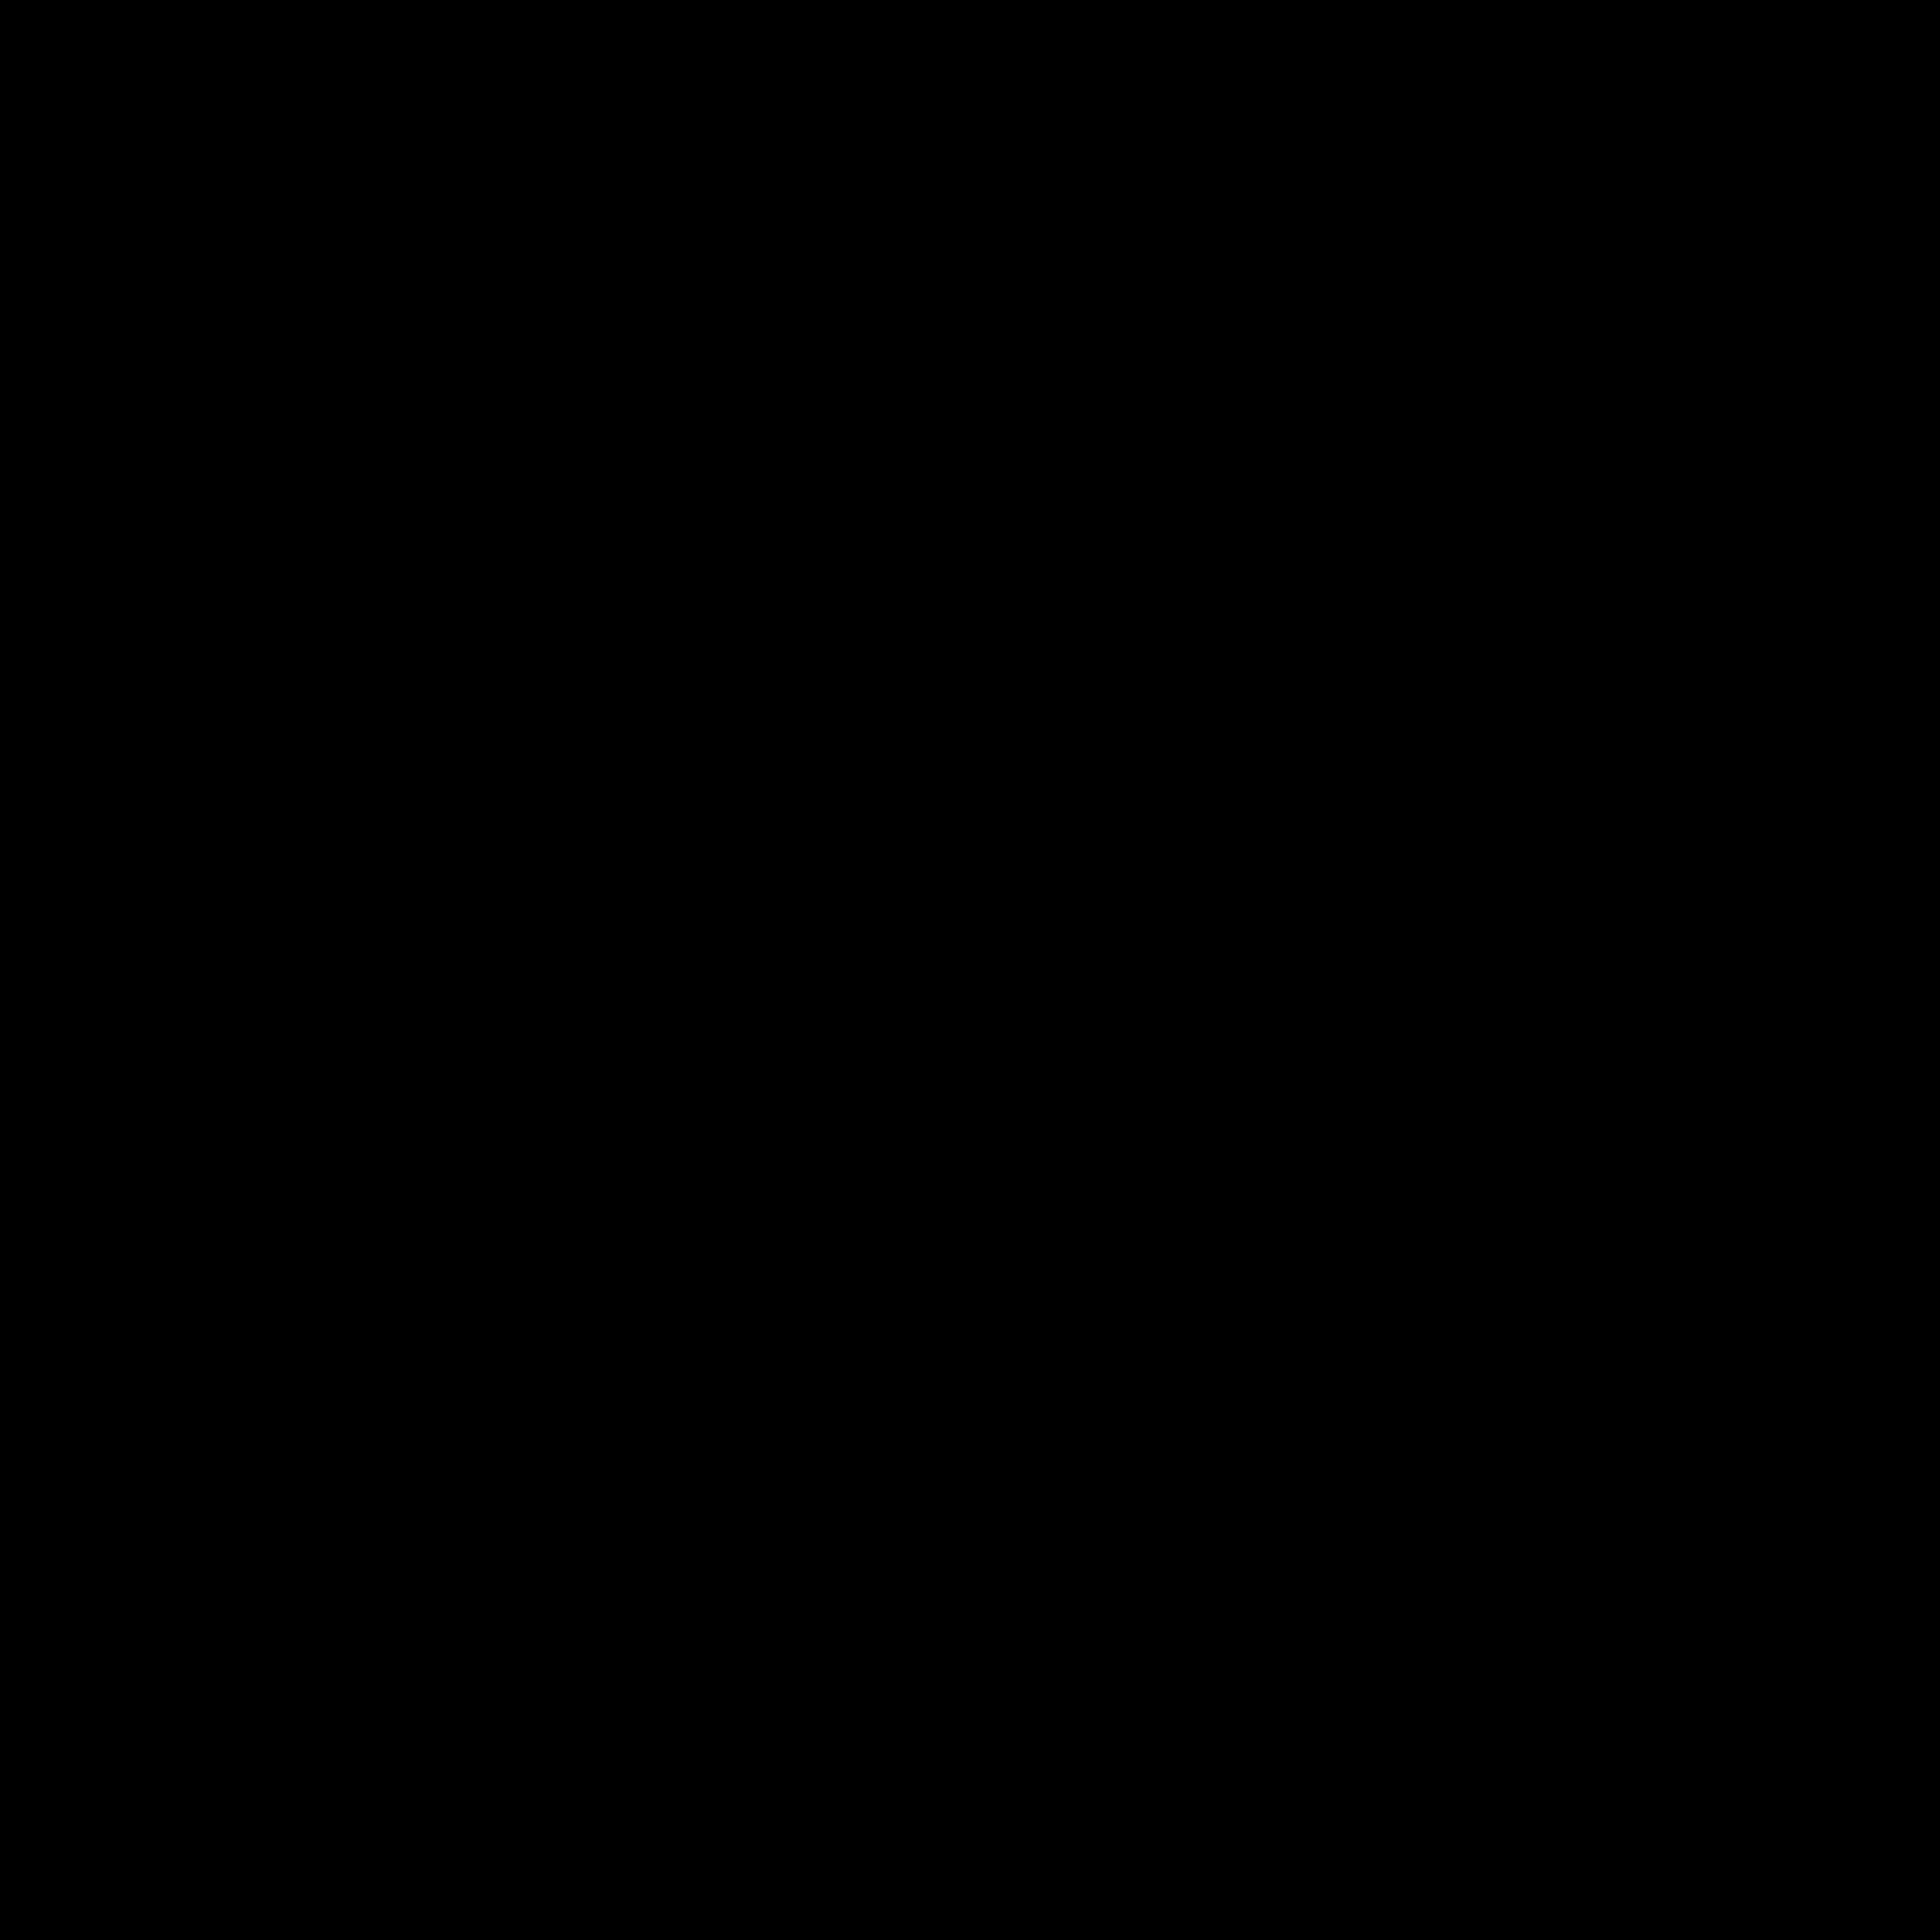 Bbc Logo PNG - 178605